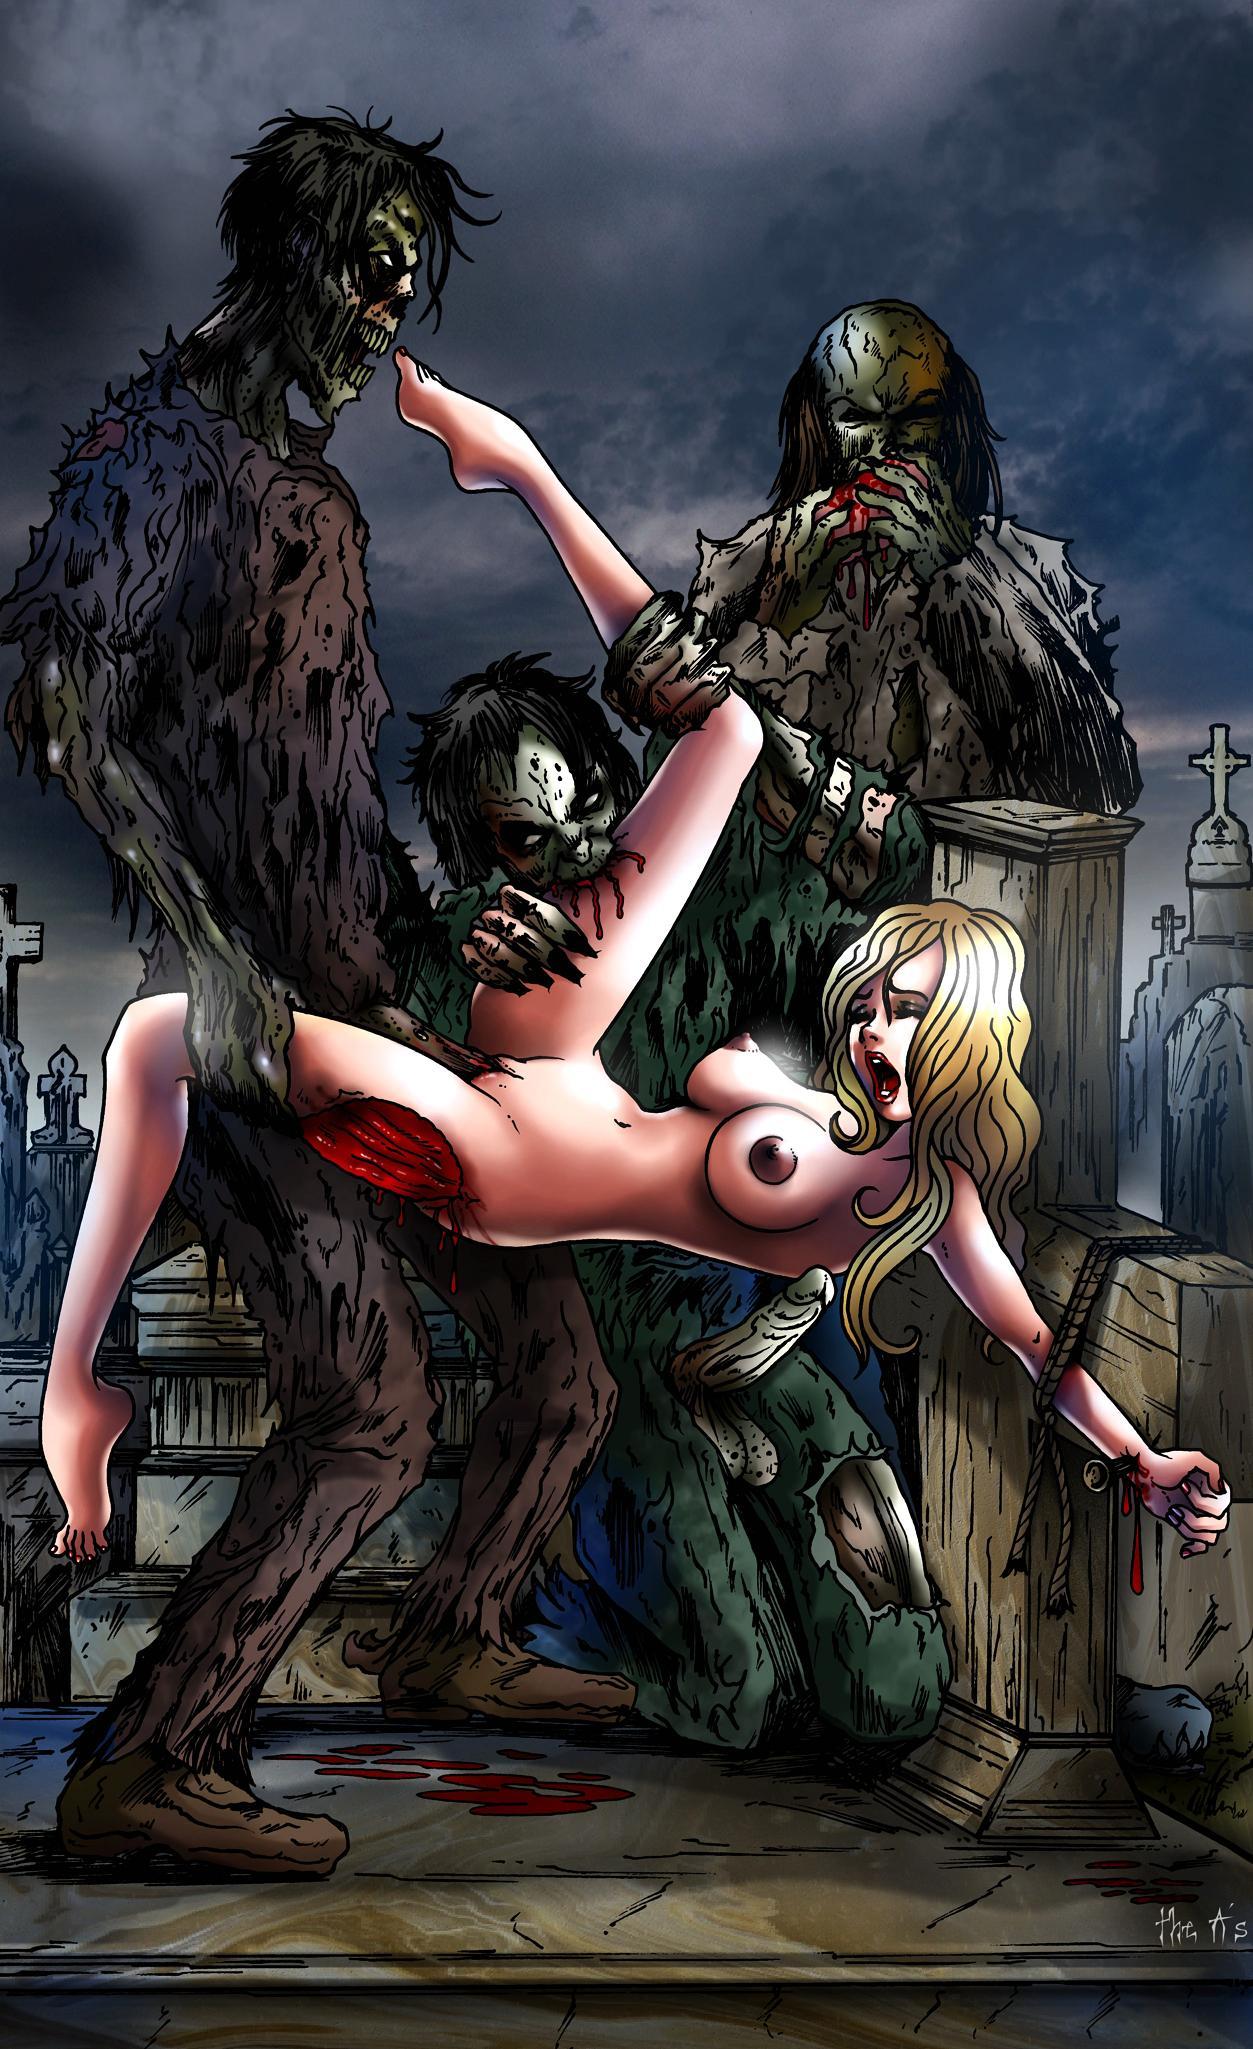 Zombie cartoon sex pics xxx picture